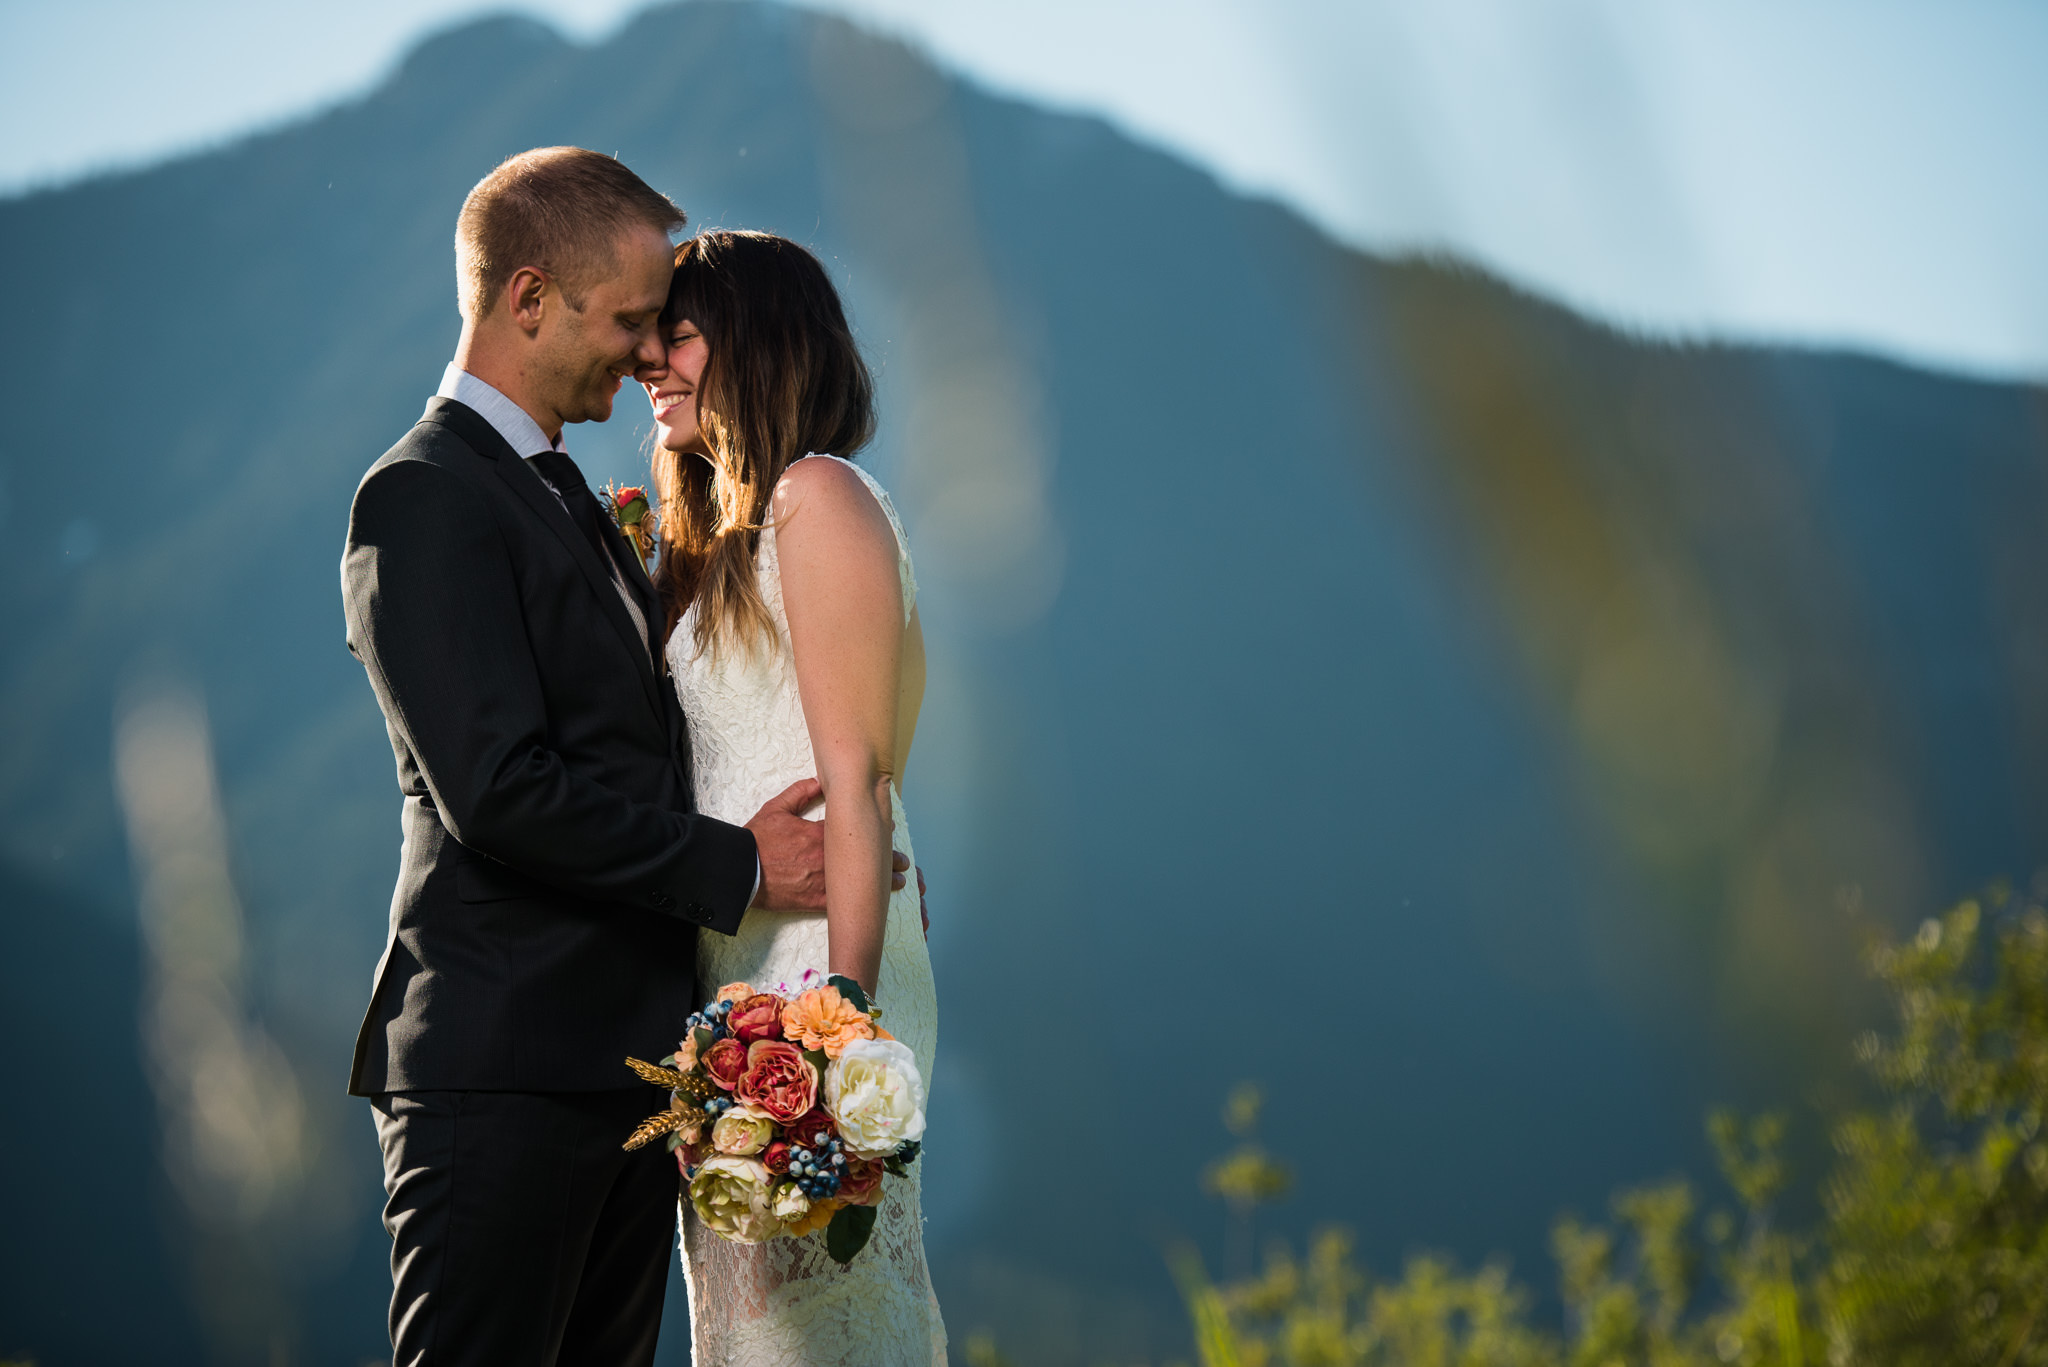 Melanie-Matt-Pitt-Lake-Post-Wedding-Shoot-Victoria-Wedding-Photographers-2.jpg